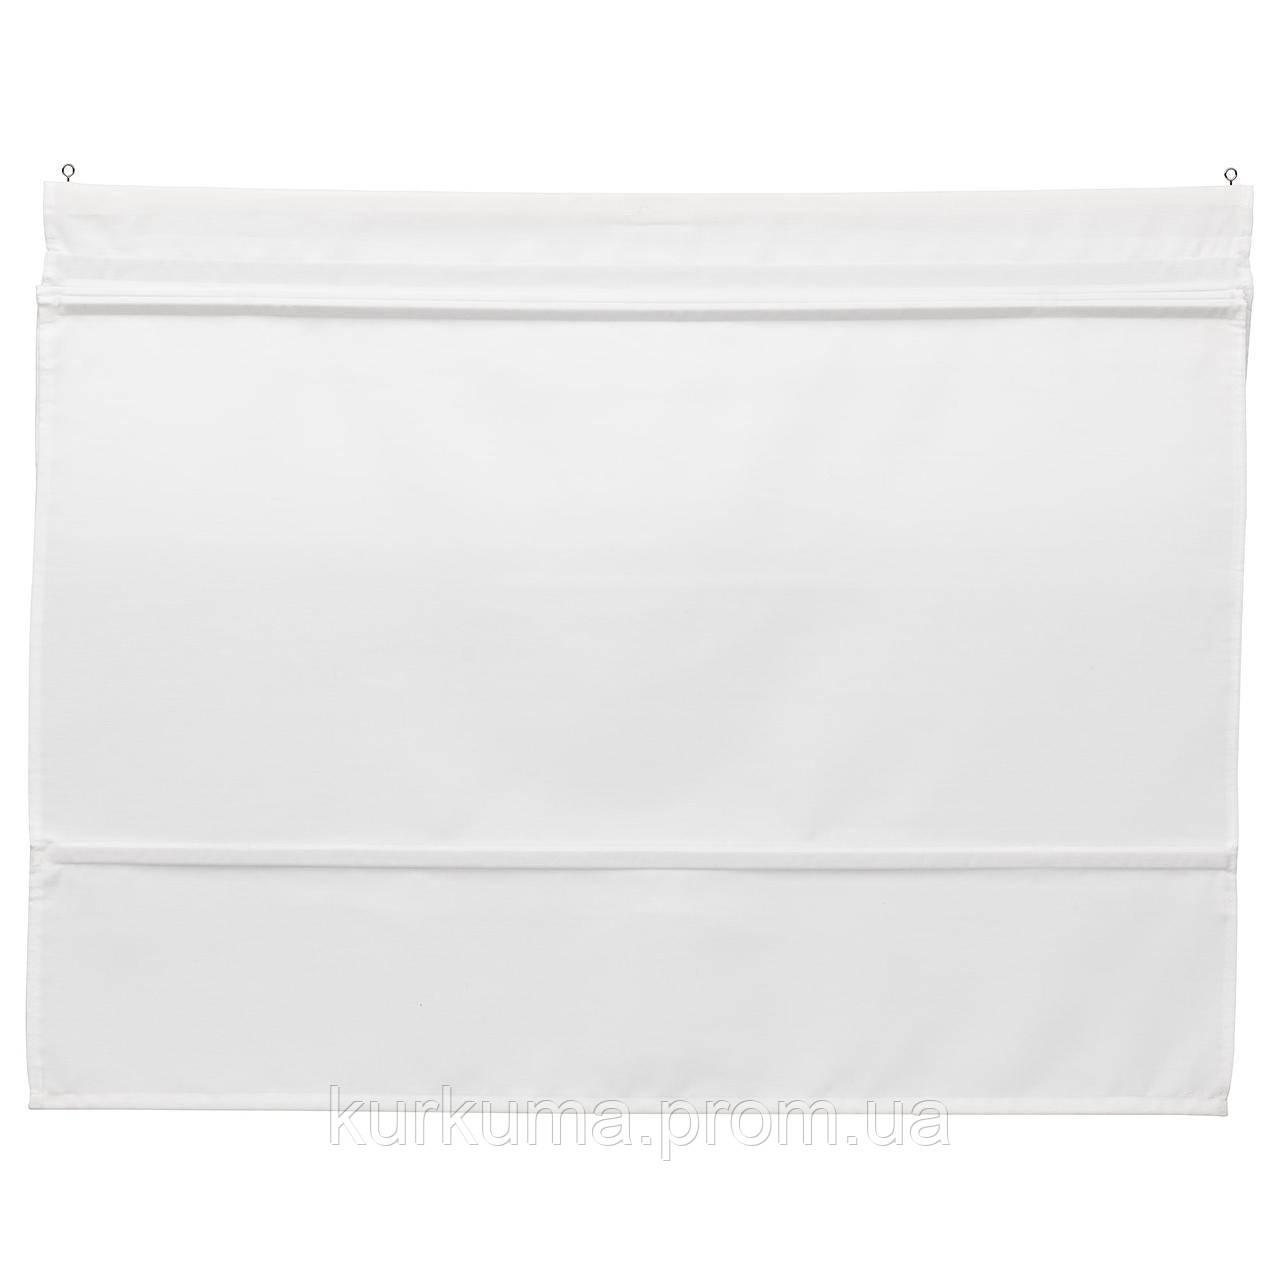 IKEA RINGBLOMMA Римские шторы, белый  (302.580.60)